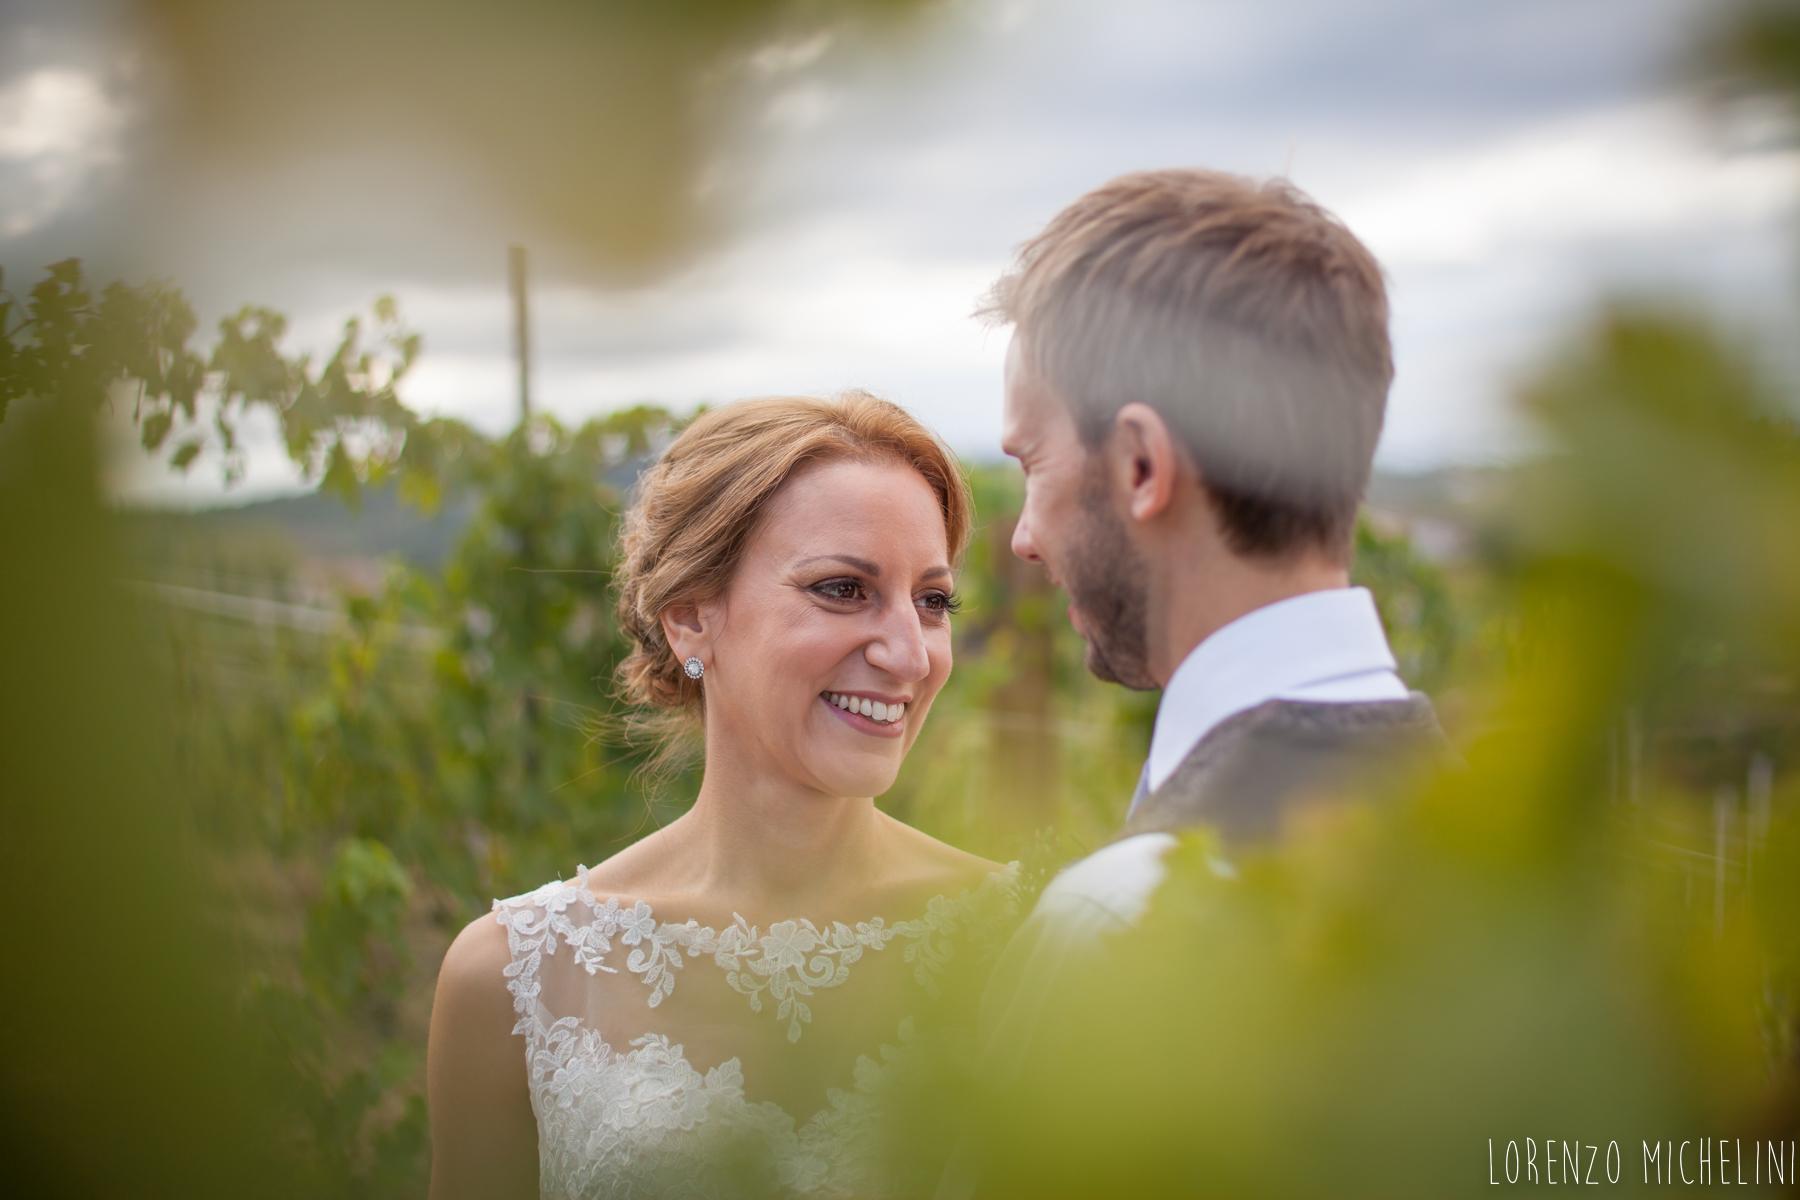 best-wedding-photographer-italy-fotografo-sposi-toscana-53